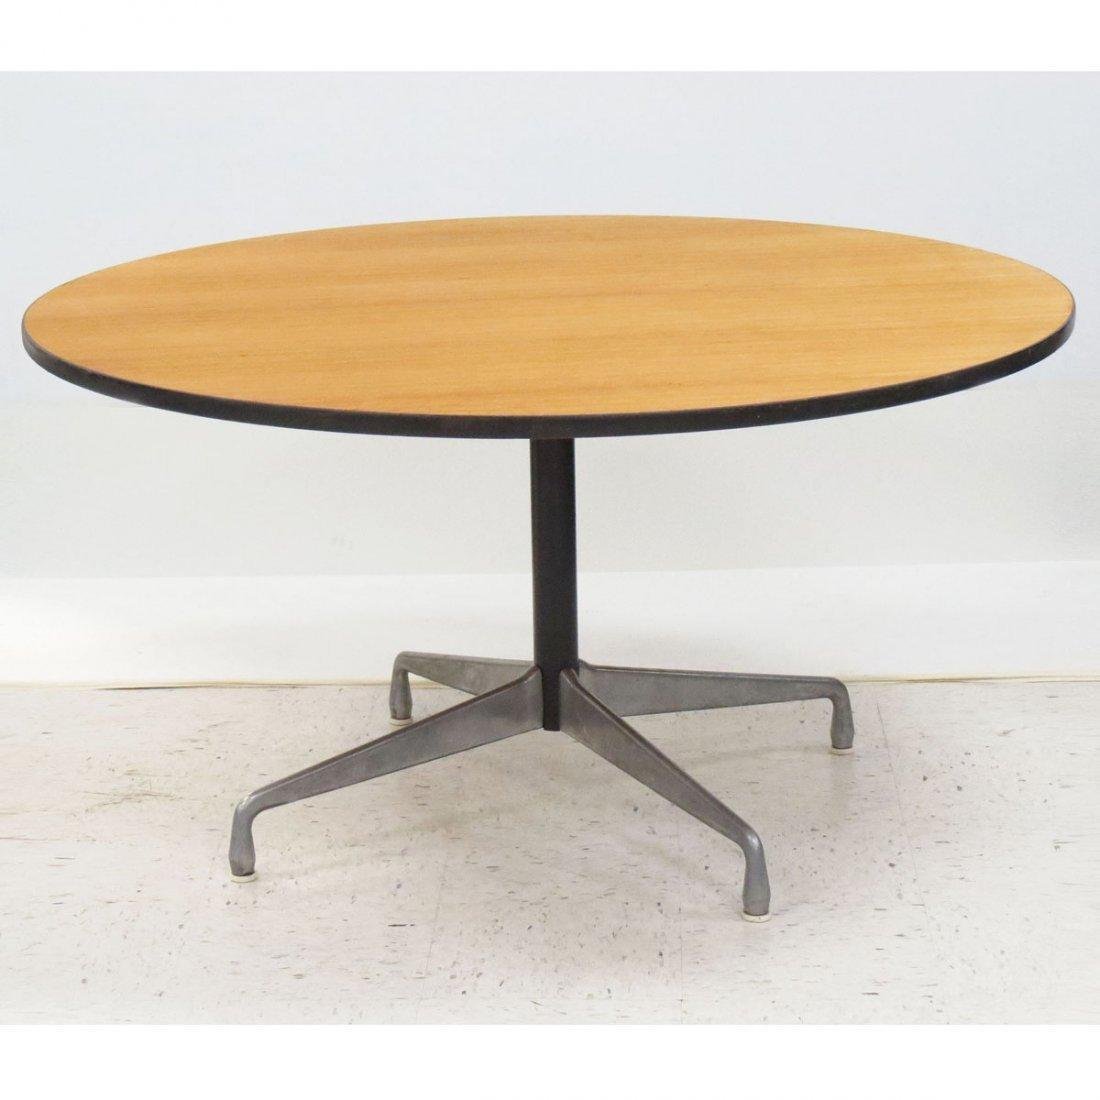 HERMAN MILLER ROUND OAK DINING TABLE